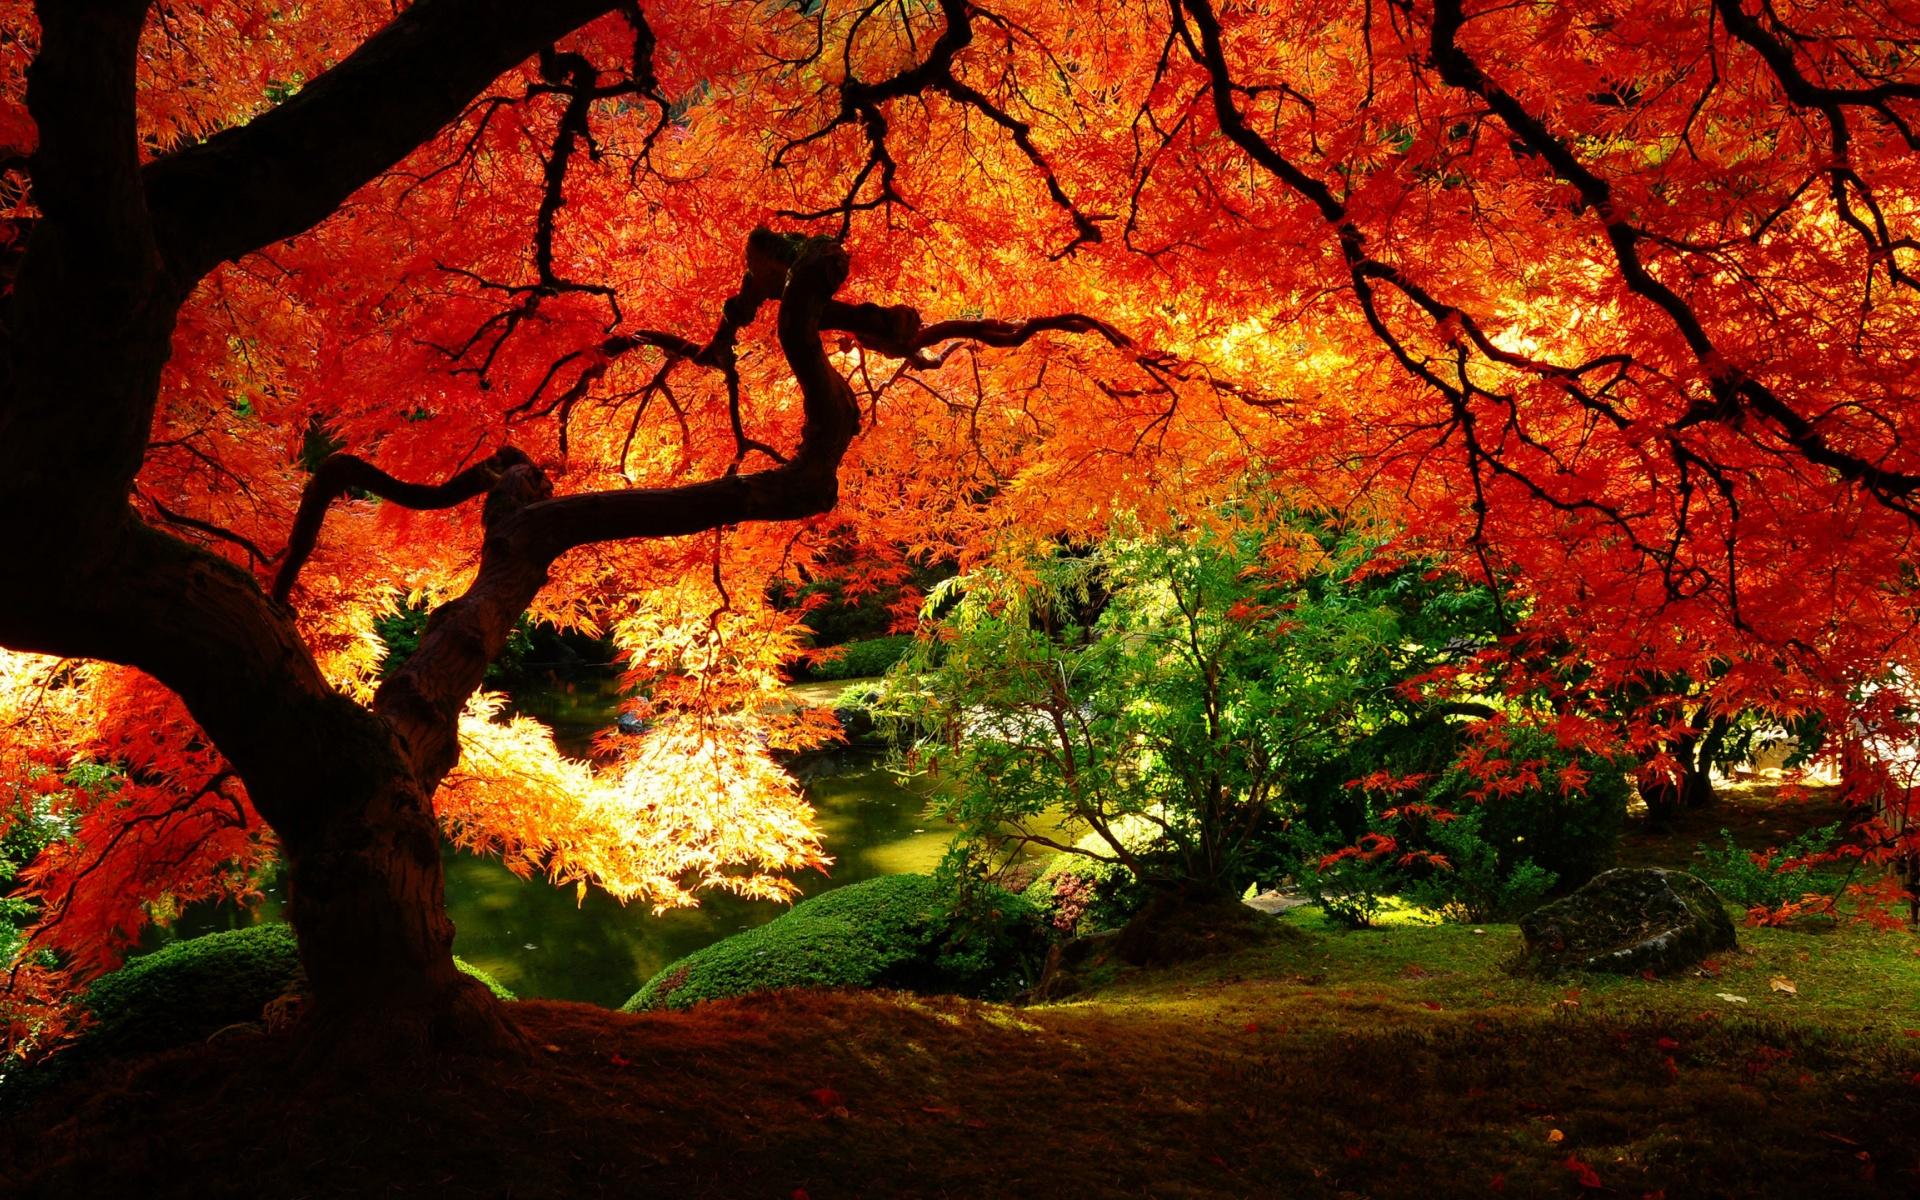 Beautiful Autumn Red Leaves HD Wallpaper 1920x1200